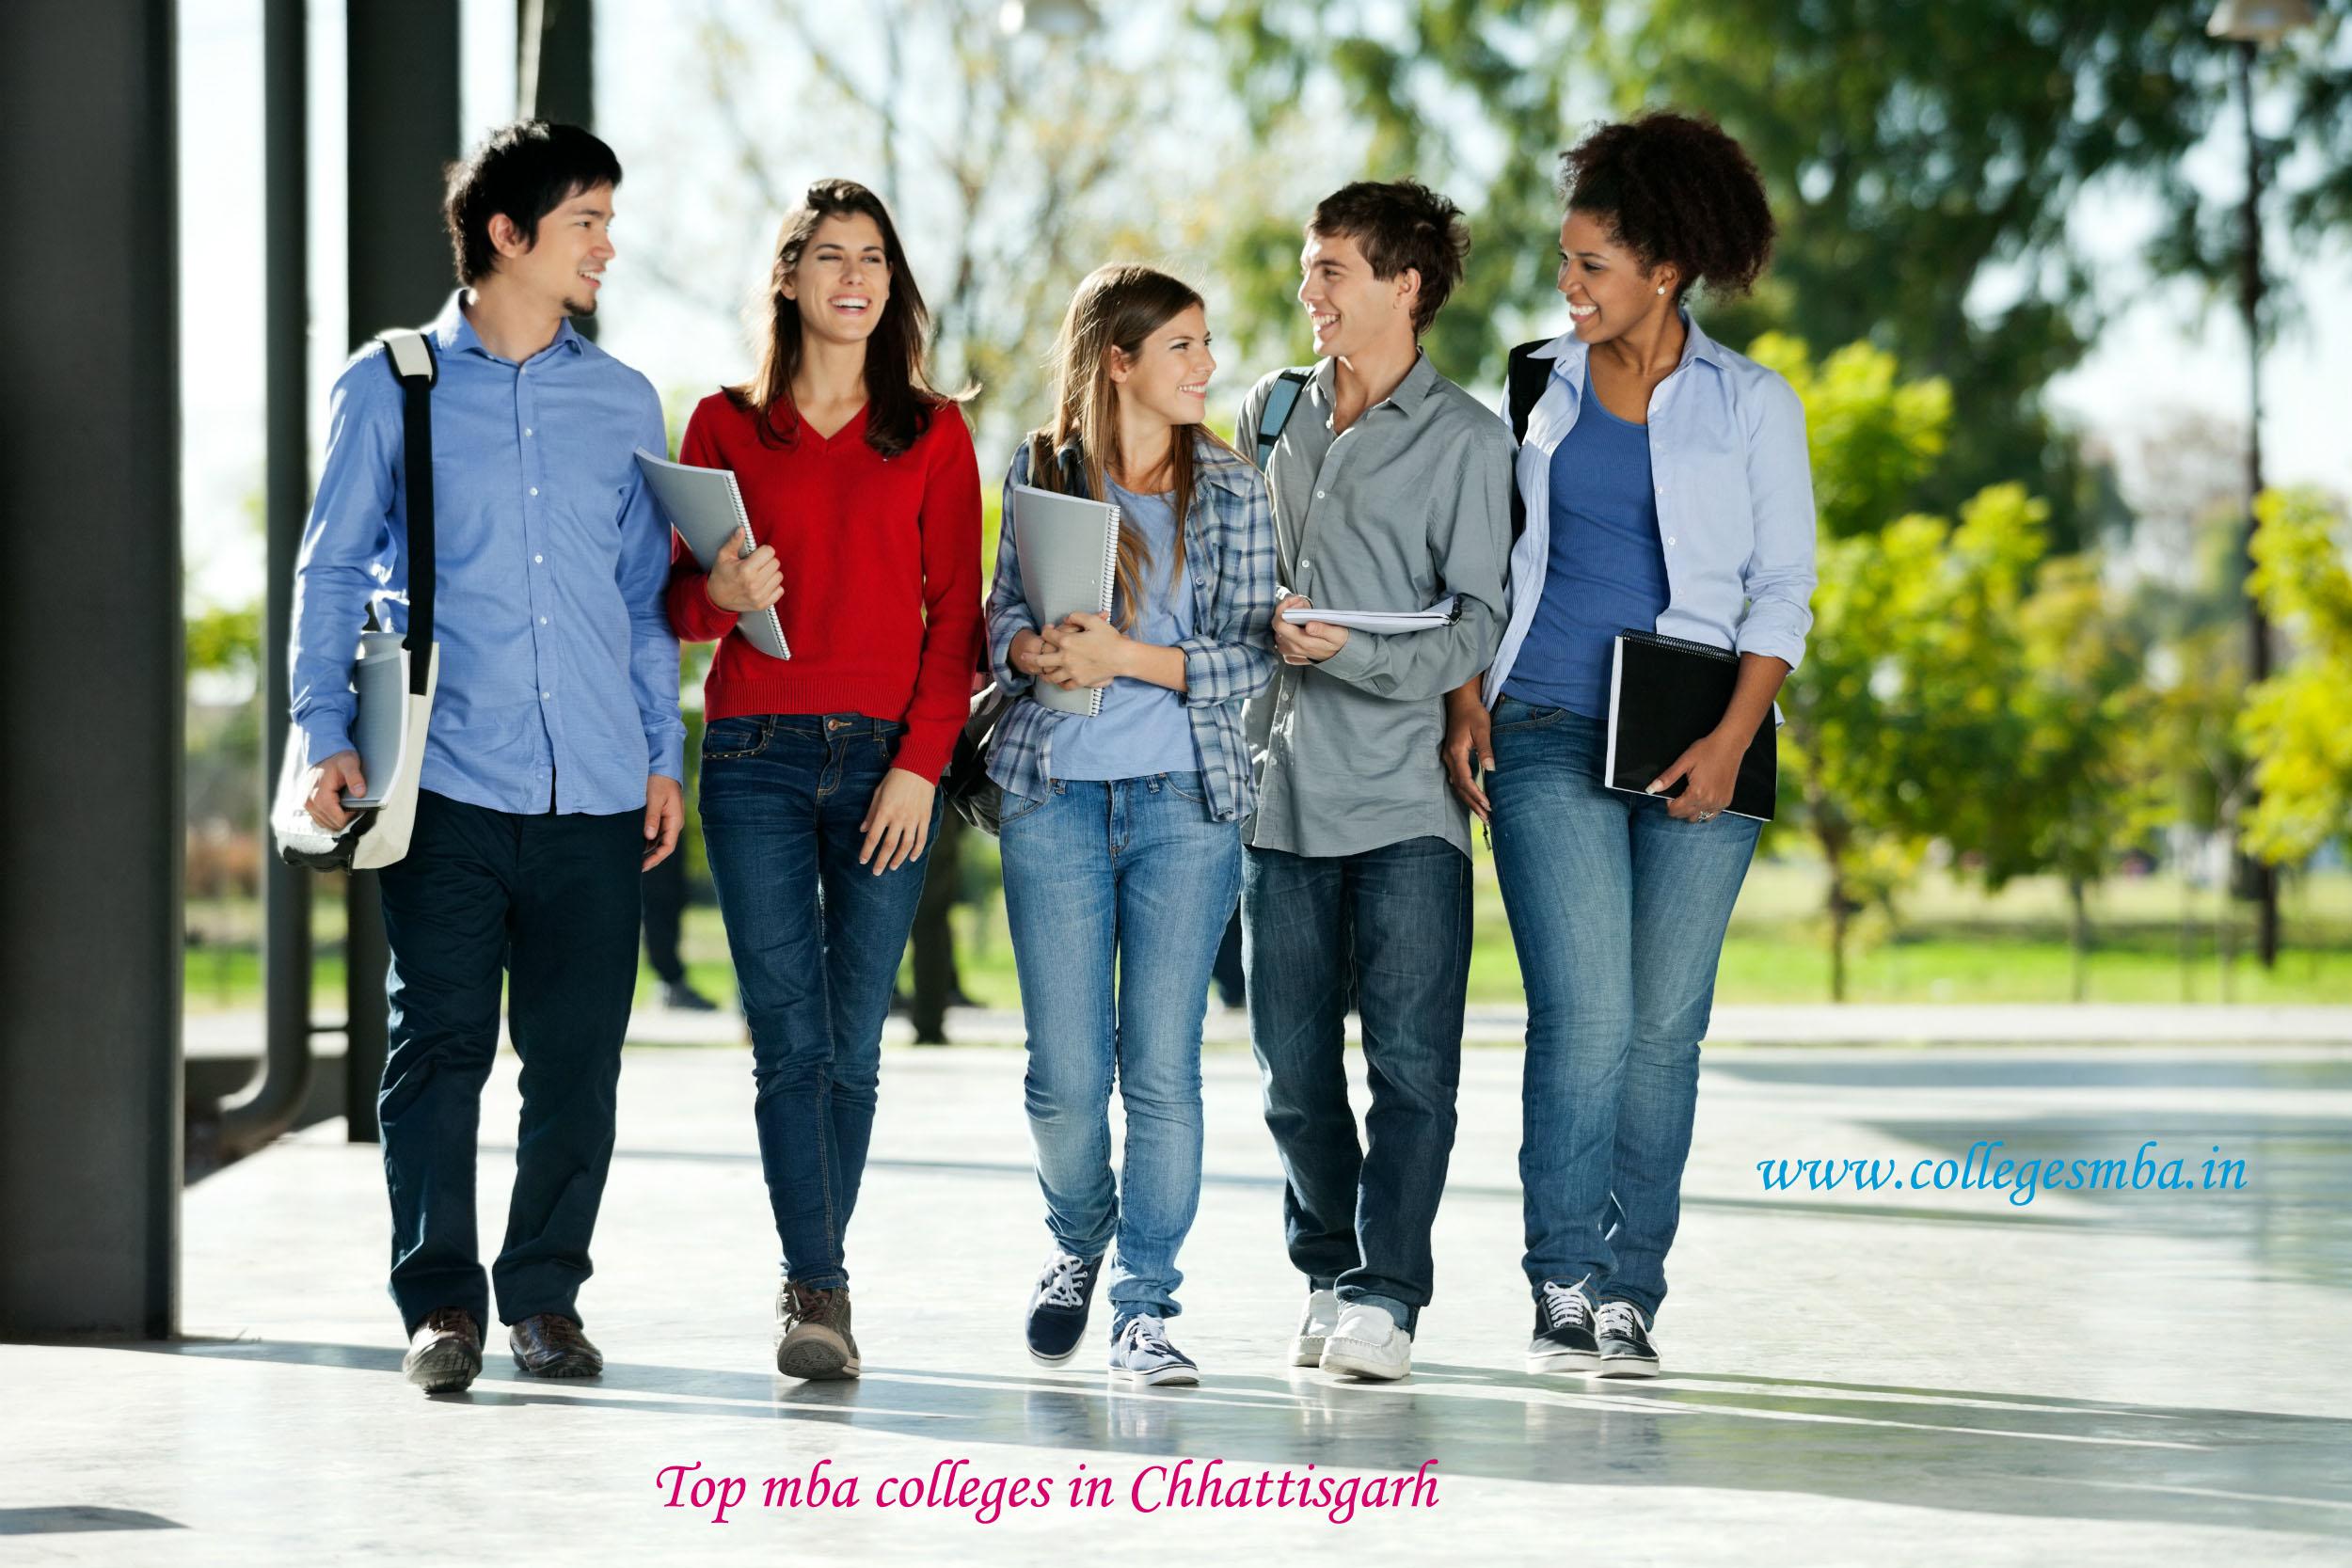 Top MBA Colleges in Chhattisgarh